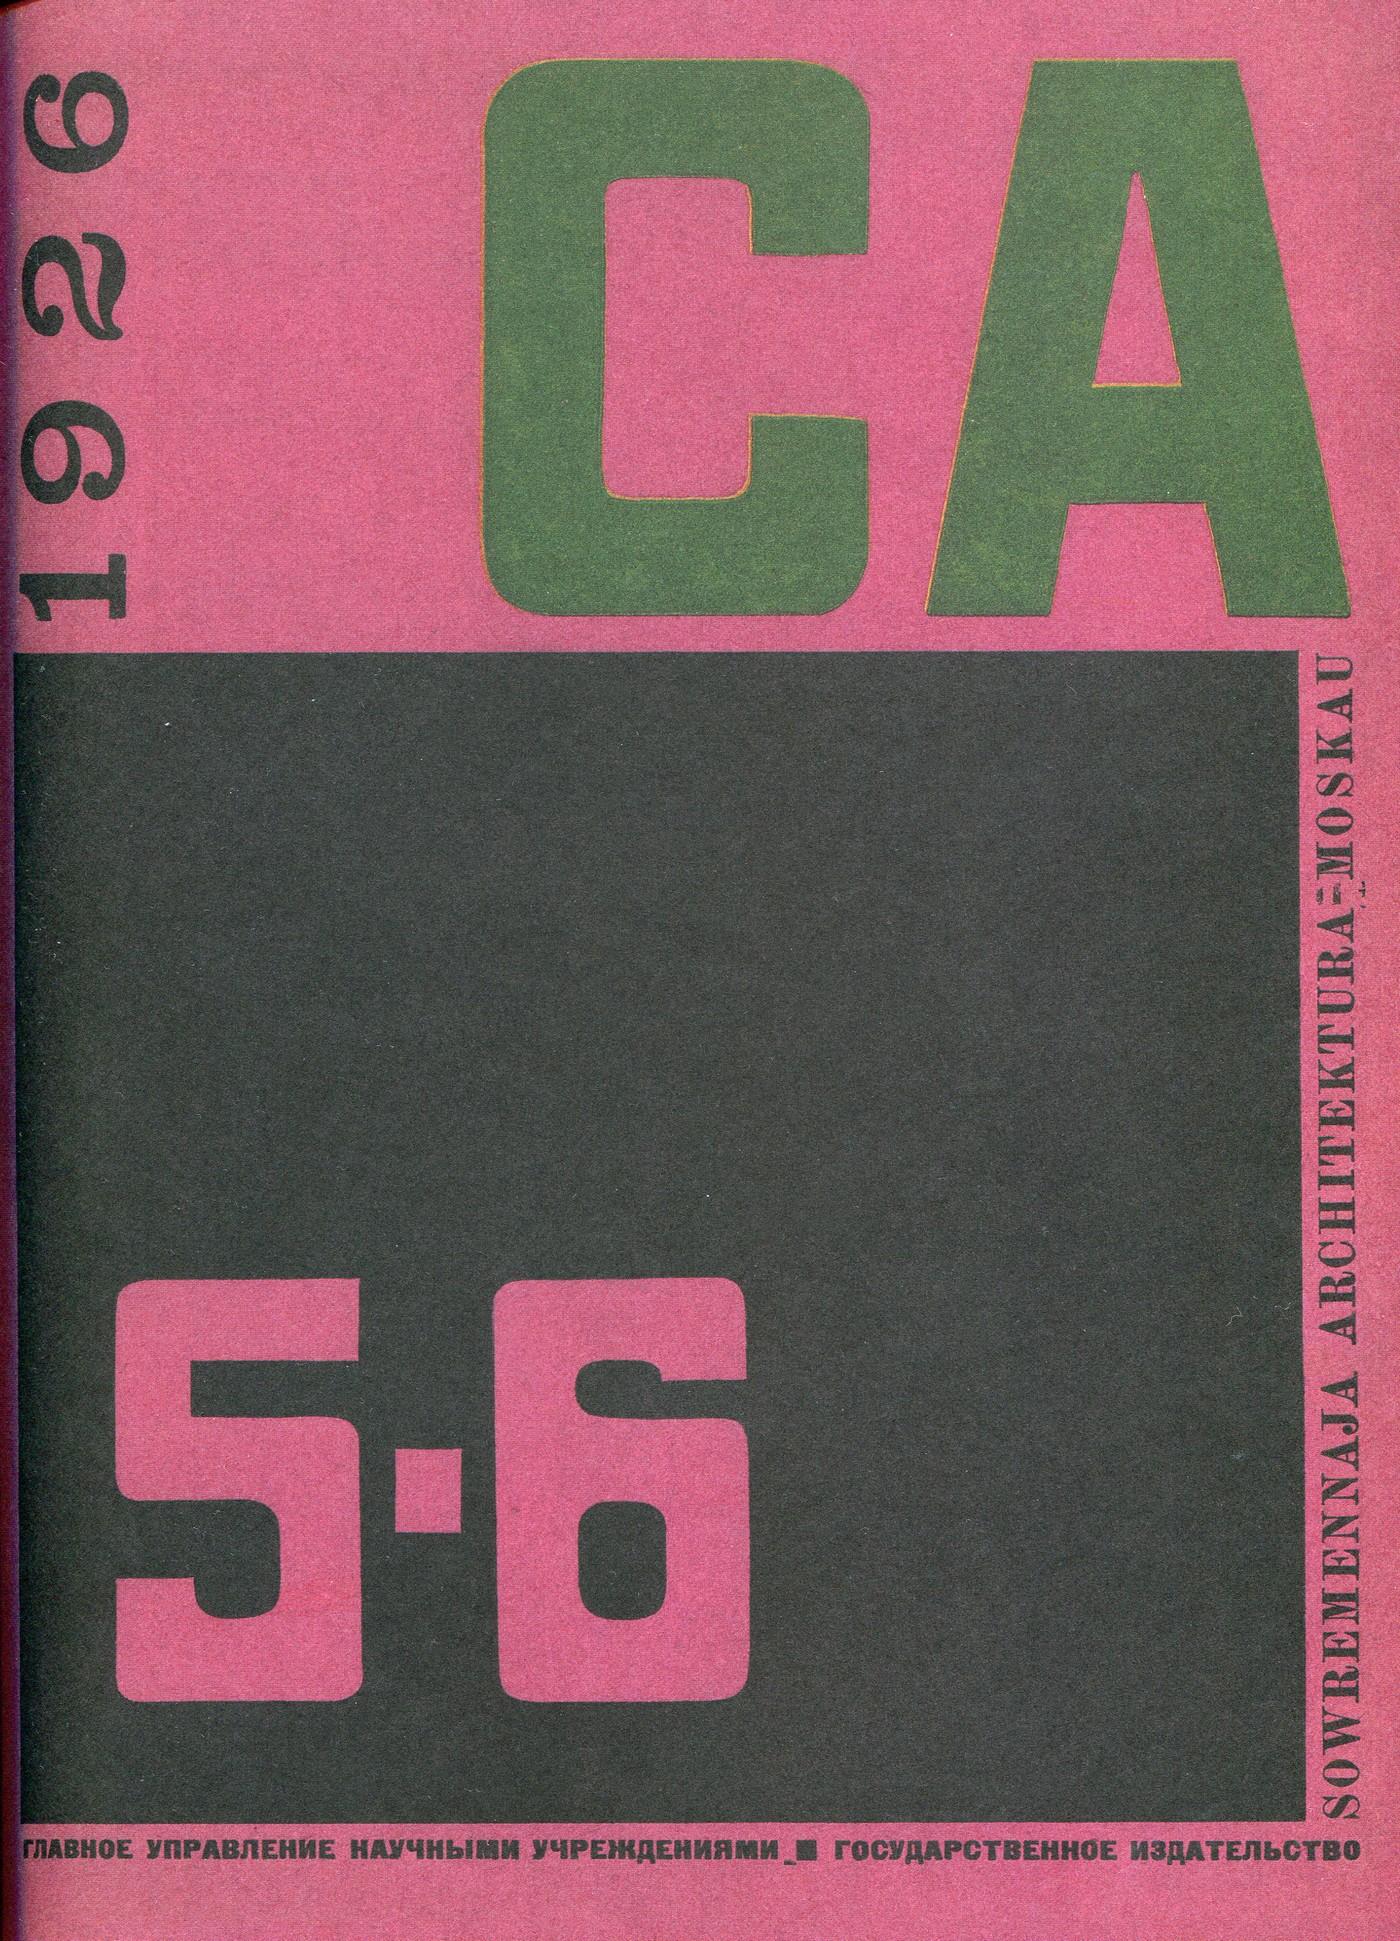 tehne.com-sa-1926-5-6-1400-0001